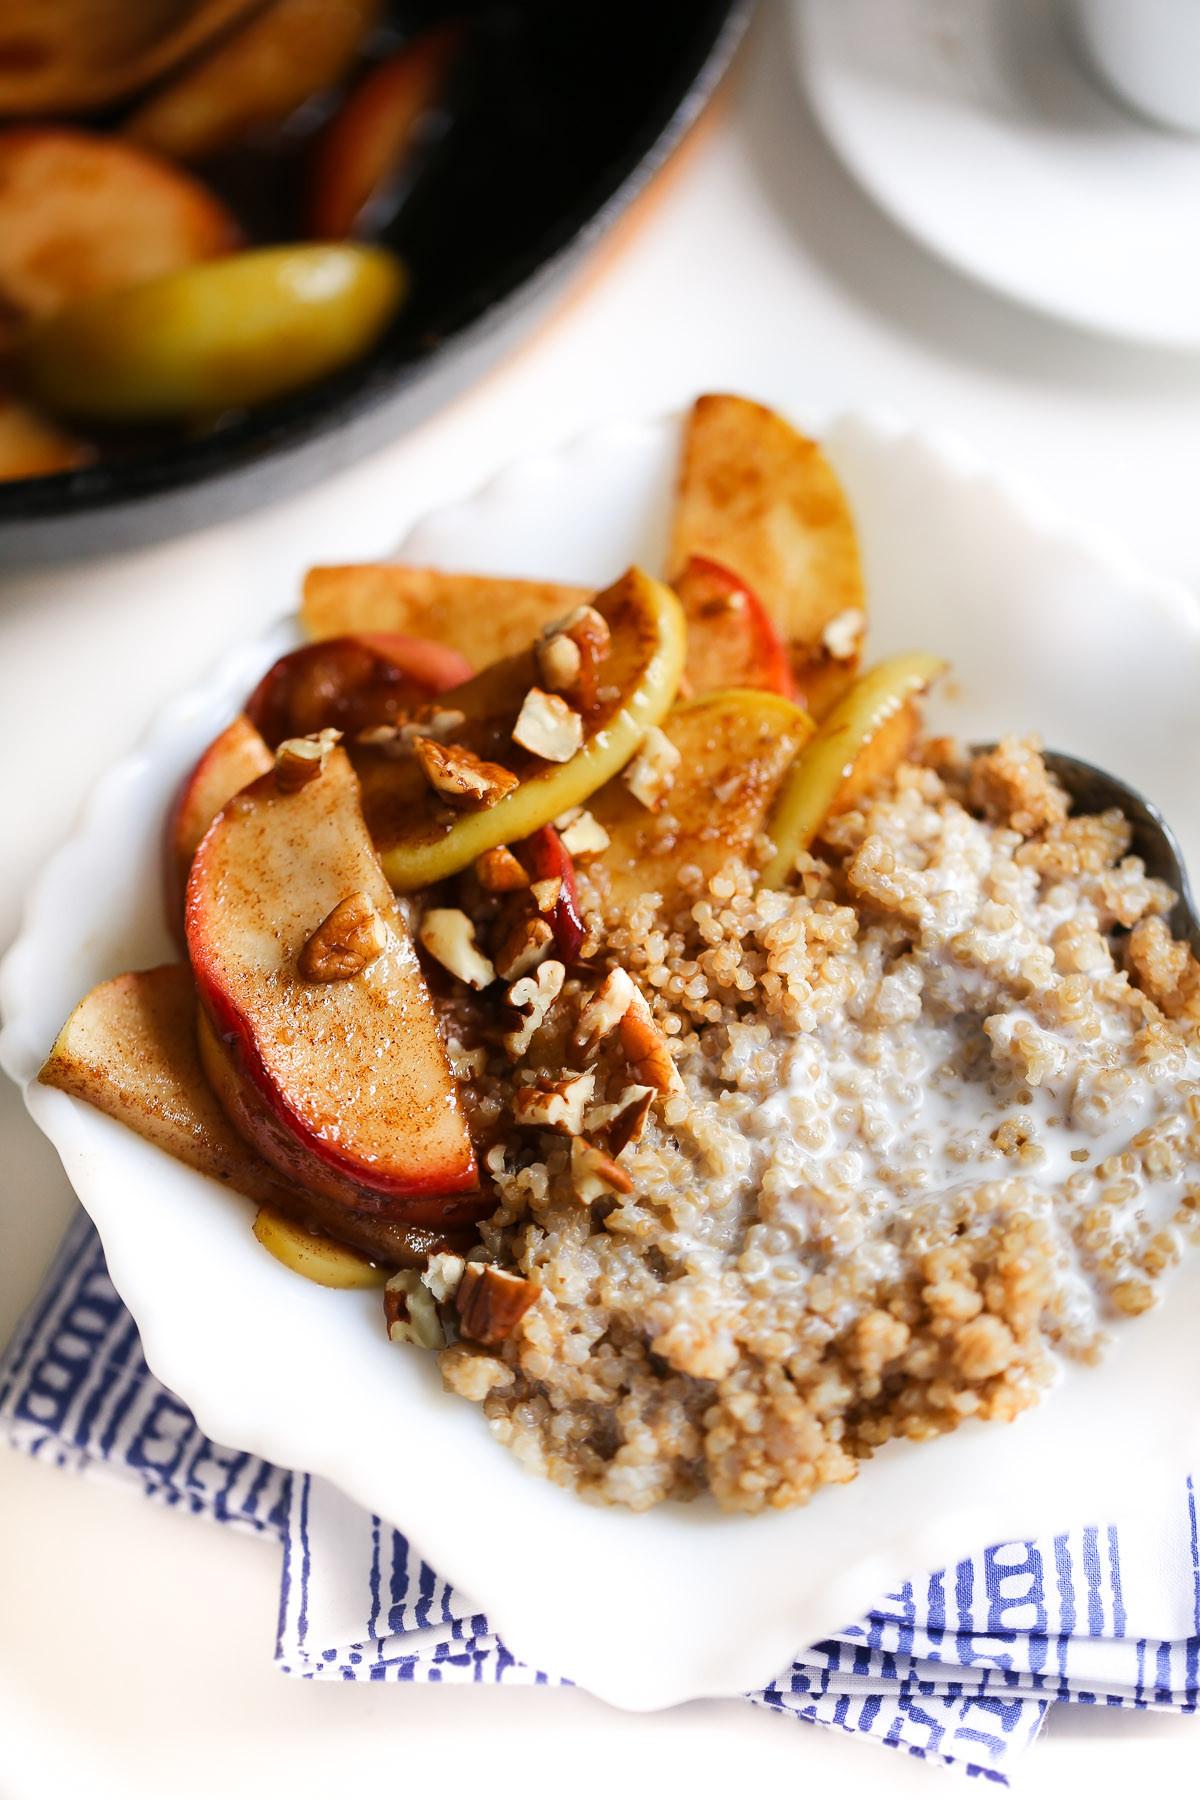 Healthy Coconut Milk Recipes  Healthy Breakfast Quinoa with Coconut Milk and Apples